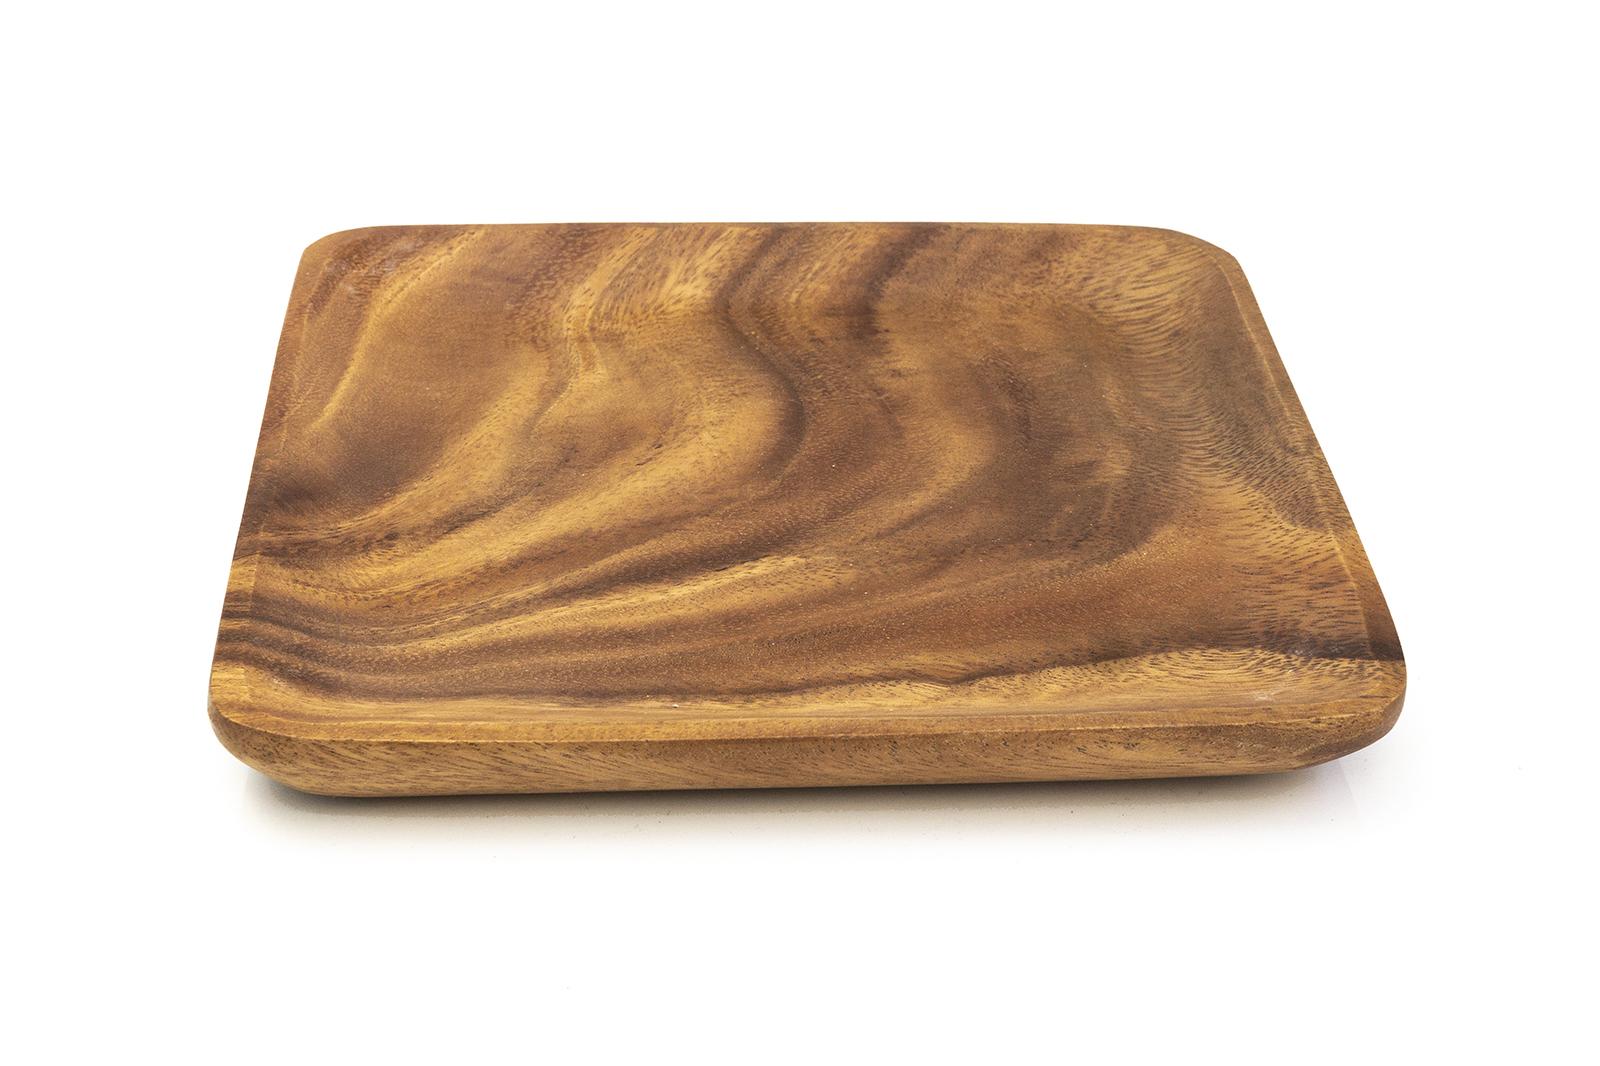 Servierteller eckig Holz Akazienholz Teller Servierplatte Fair Trade